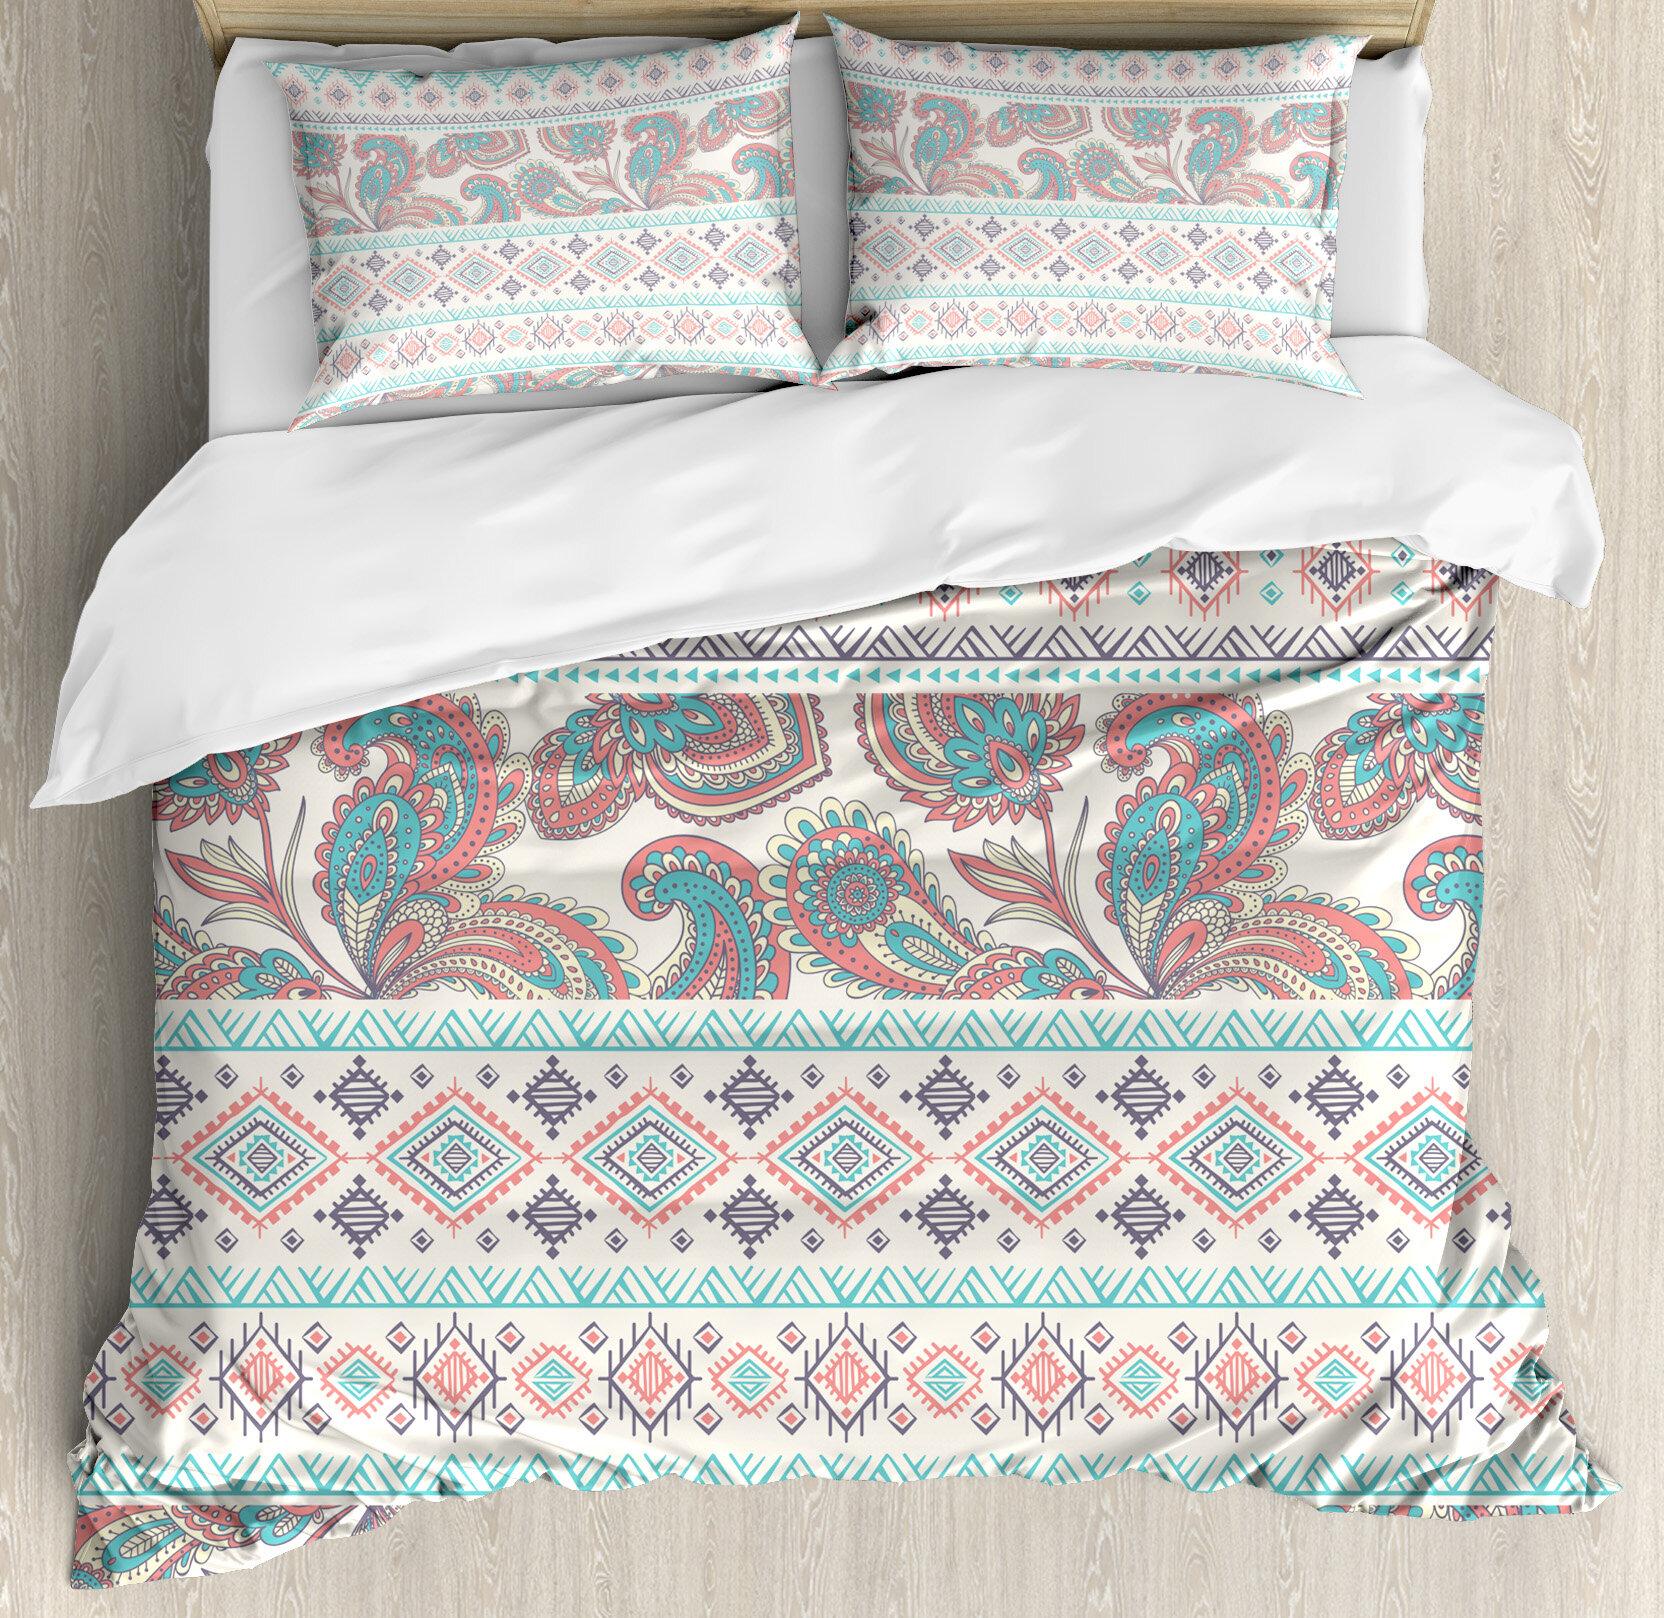 set print tribal hei bath home stripe bed comforter p wid bedding attention piece prod qlt comforters